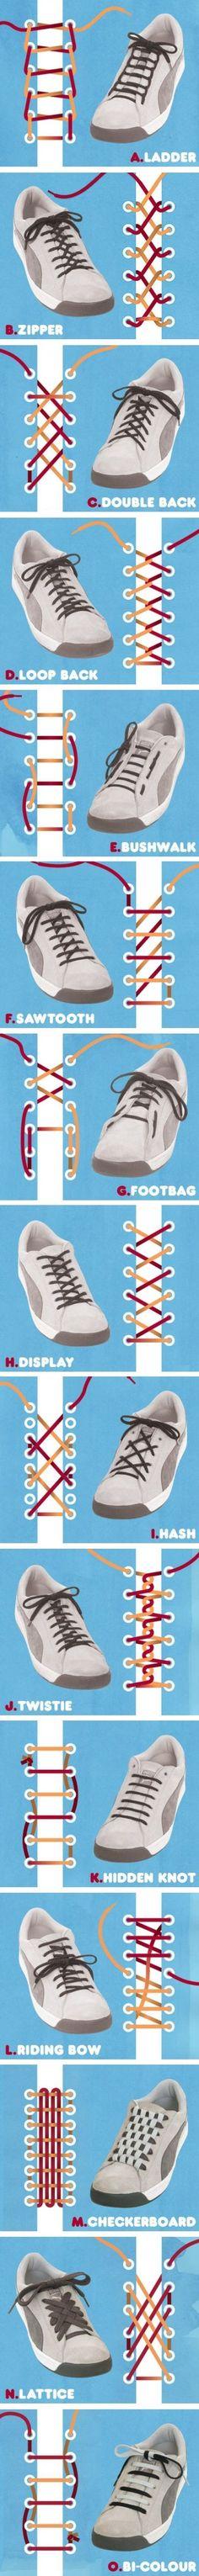 53cf1a0425 41 Shoe Lace Methods Ways To Tie Shoelaces